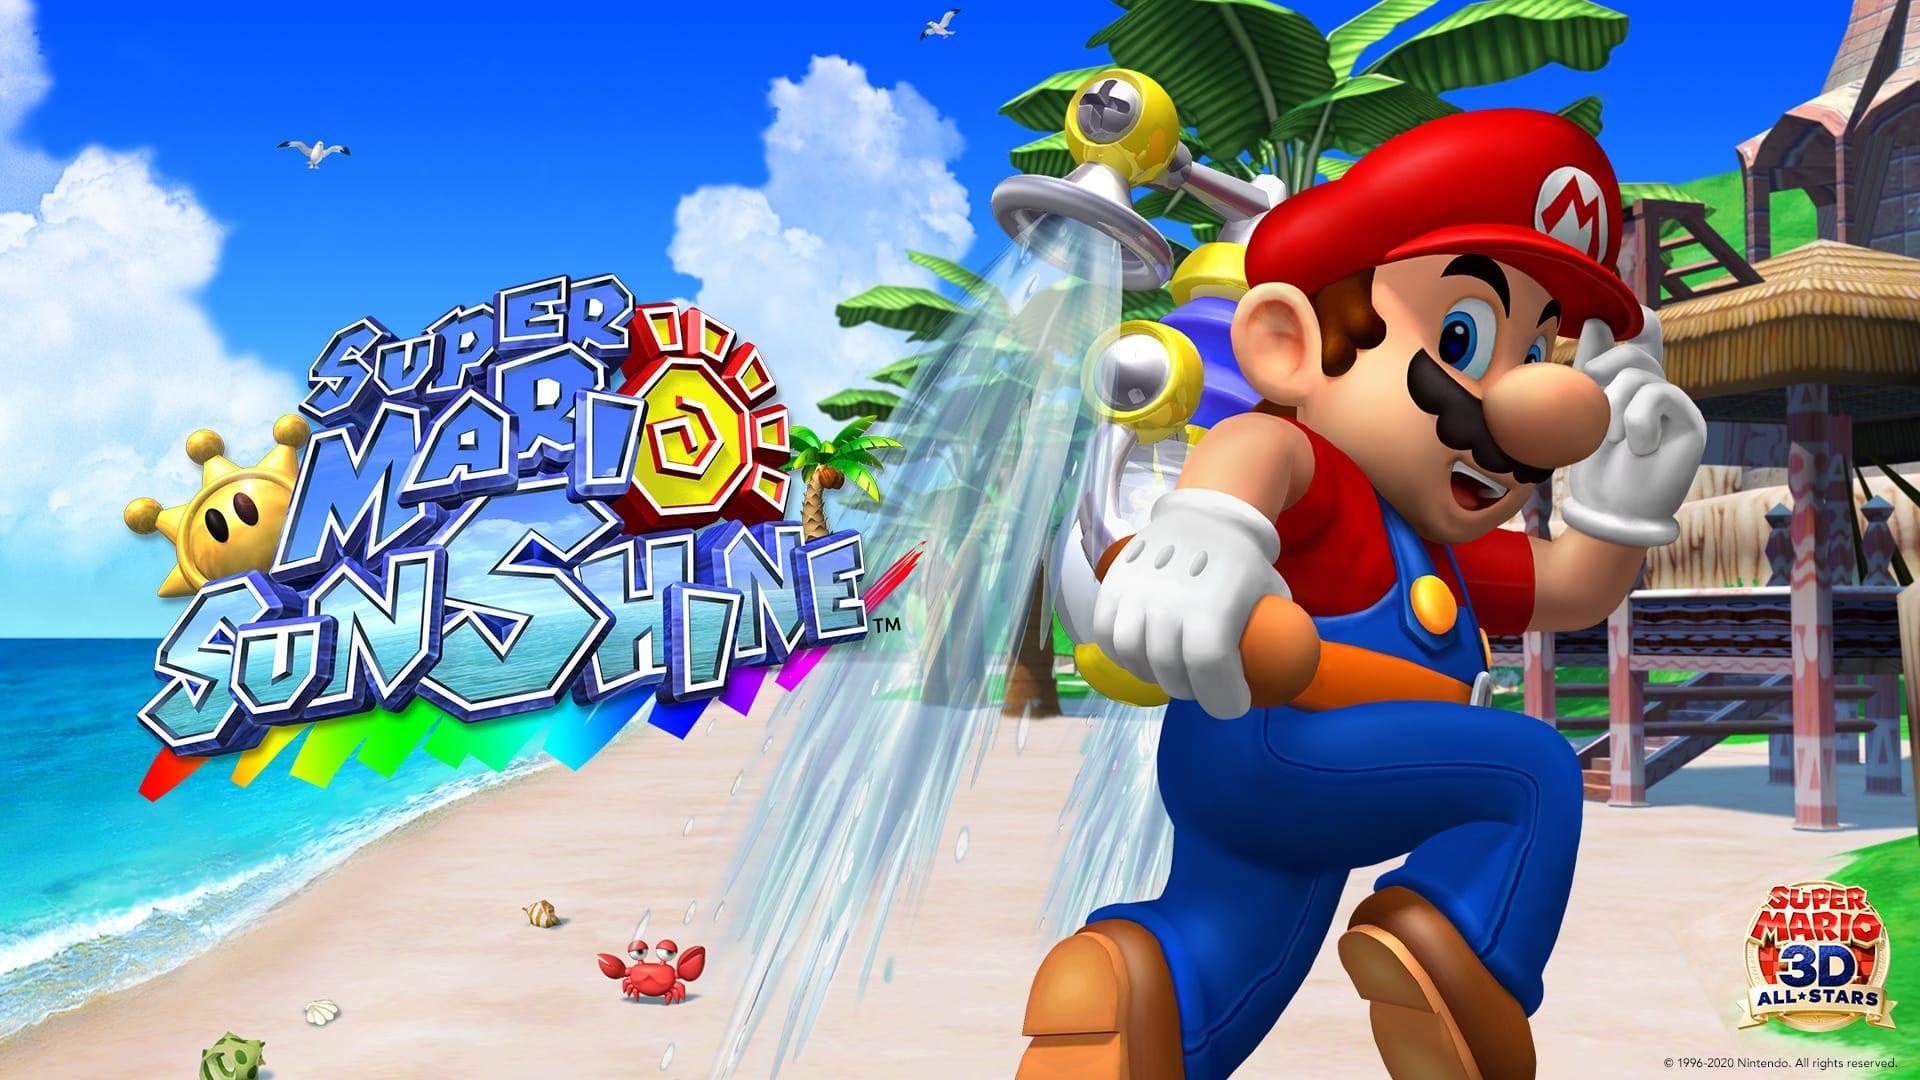 Super Mario Sunshine, How to Catch Shadow Mario